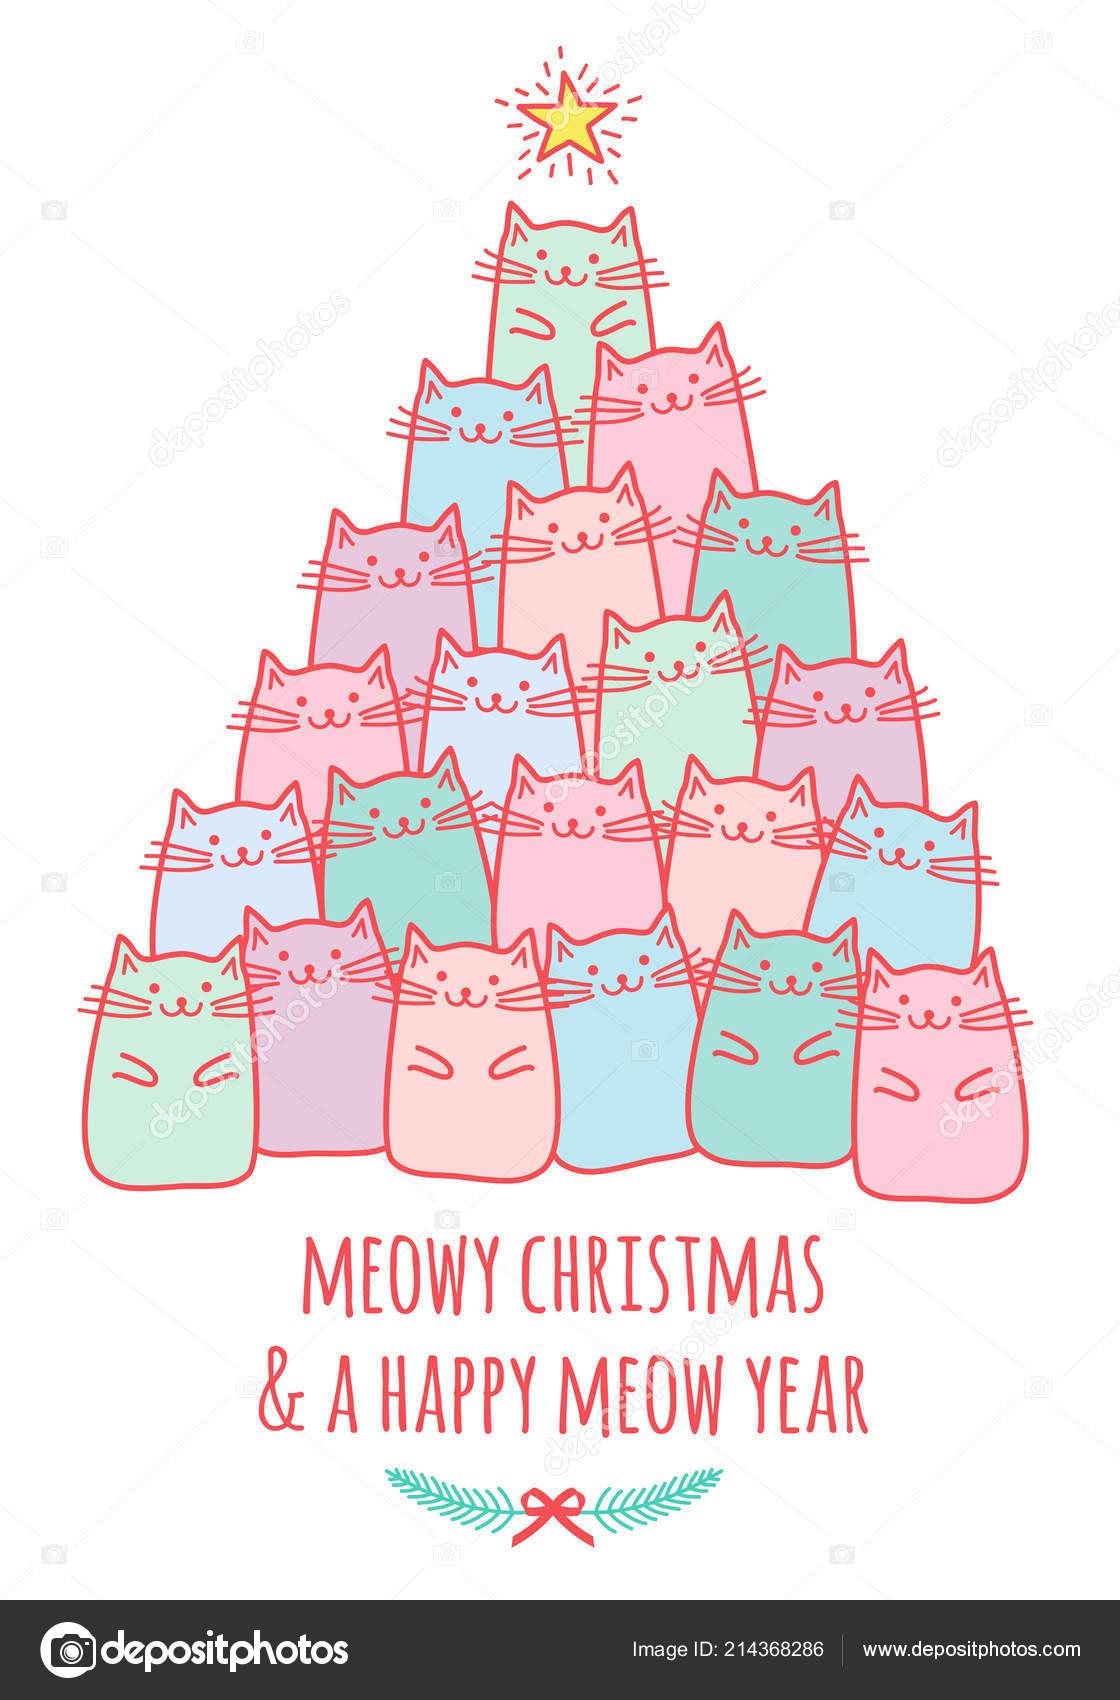 Carte Noël Avec Dessin Doodle Mignon Kawaii Chats Meowy Noël